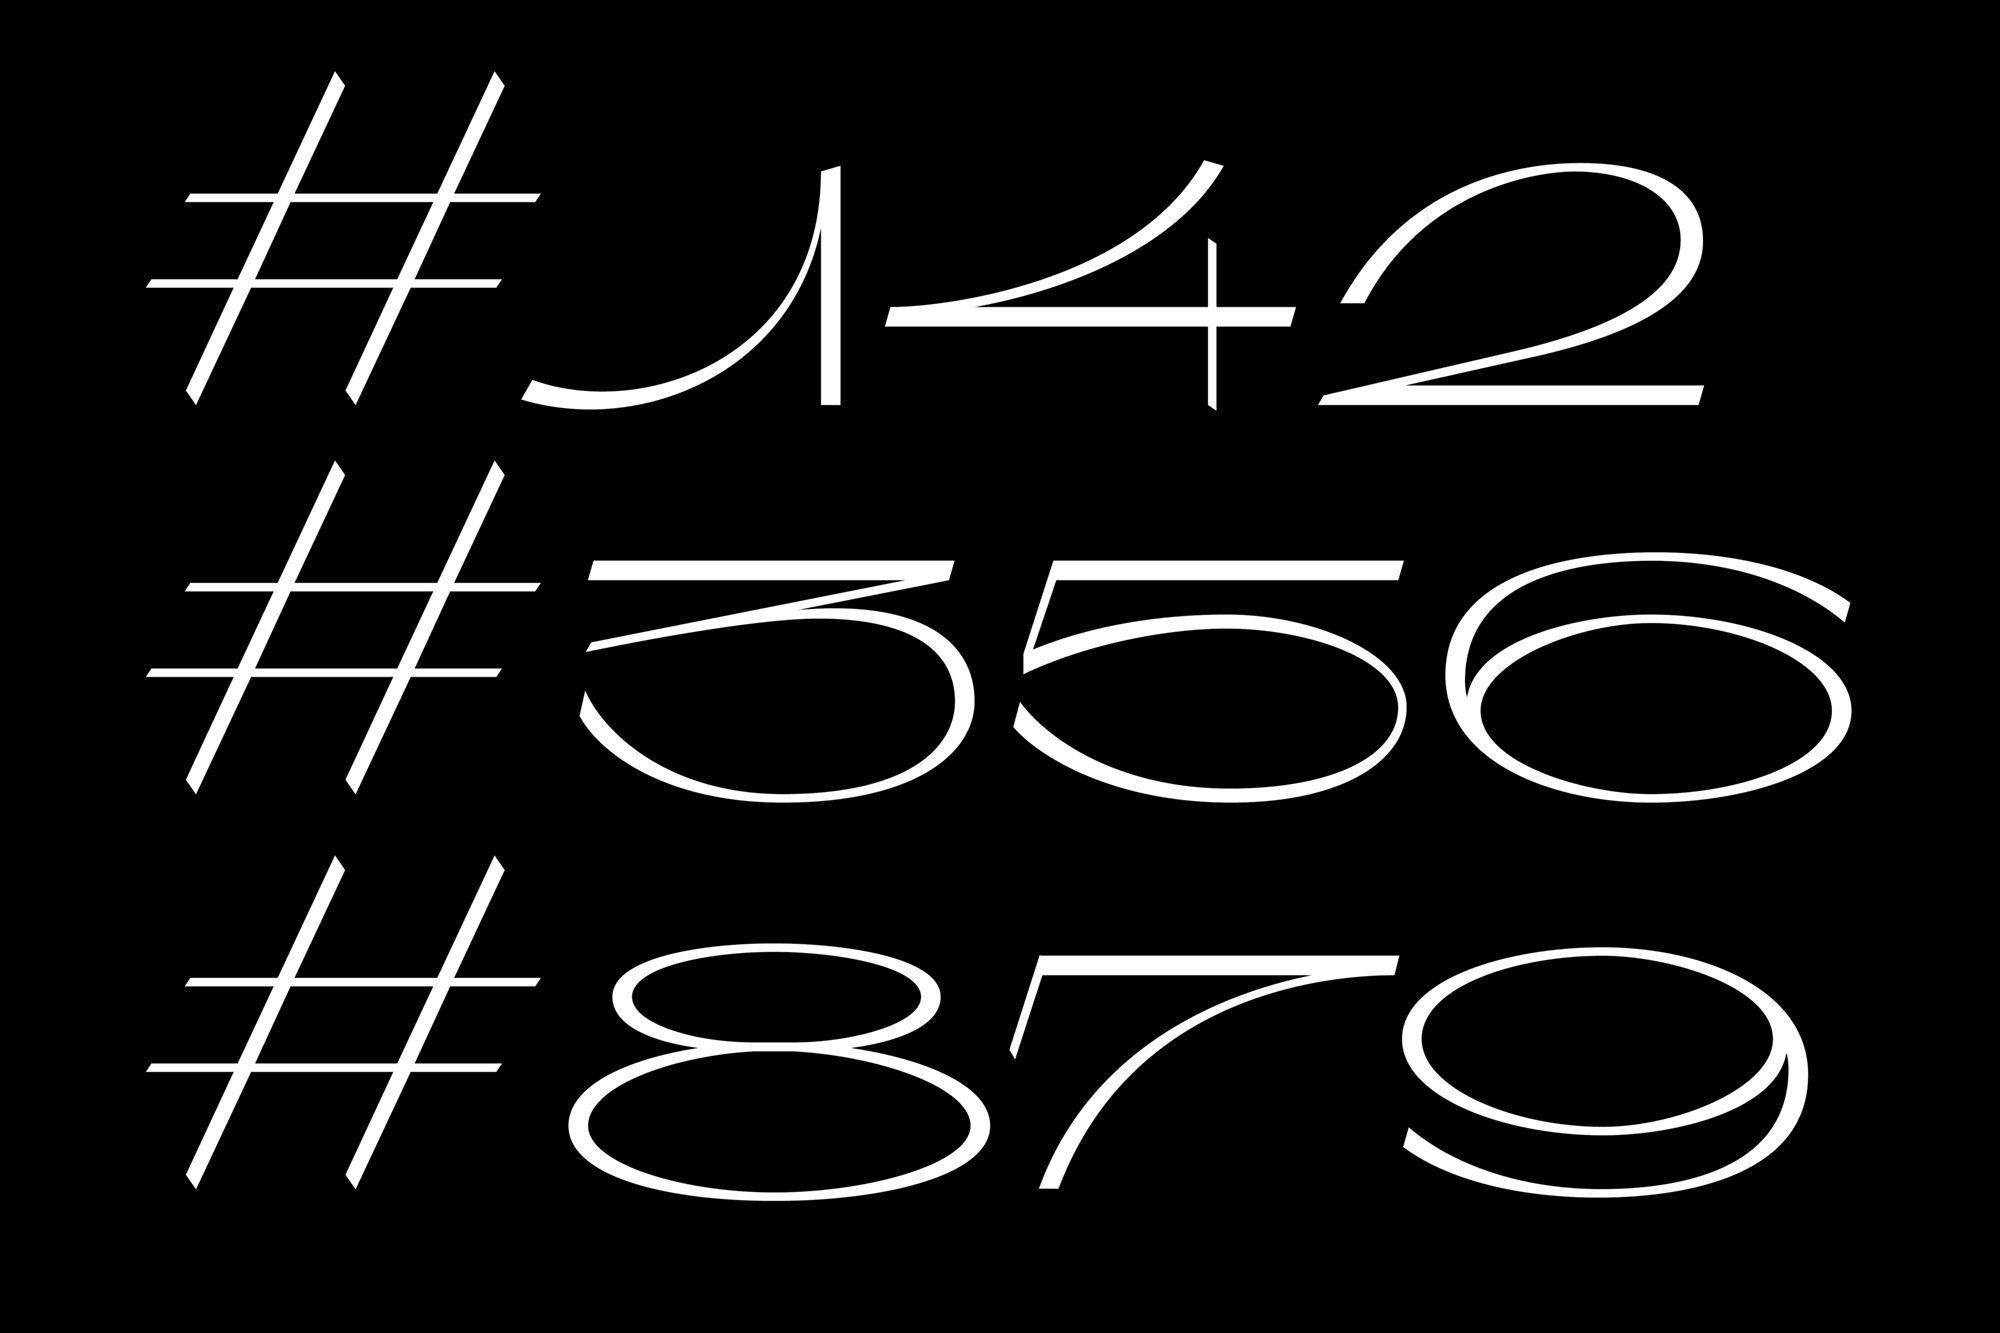 Laura Csocsan Typeface, Typeface logo, Typographic layout